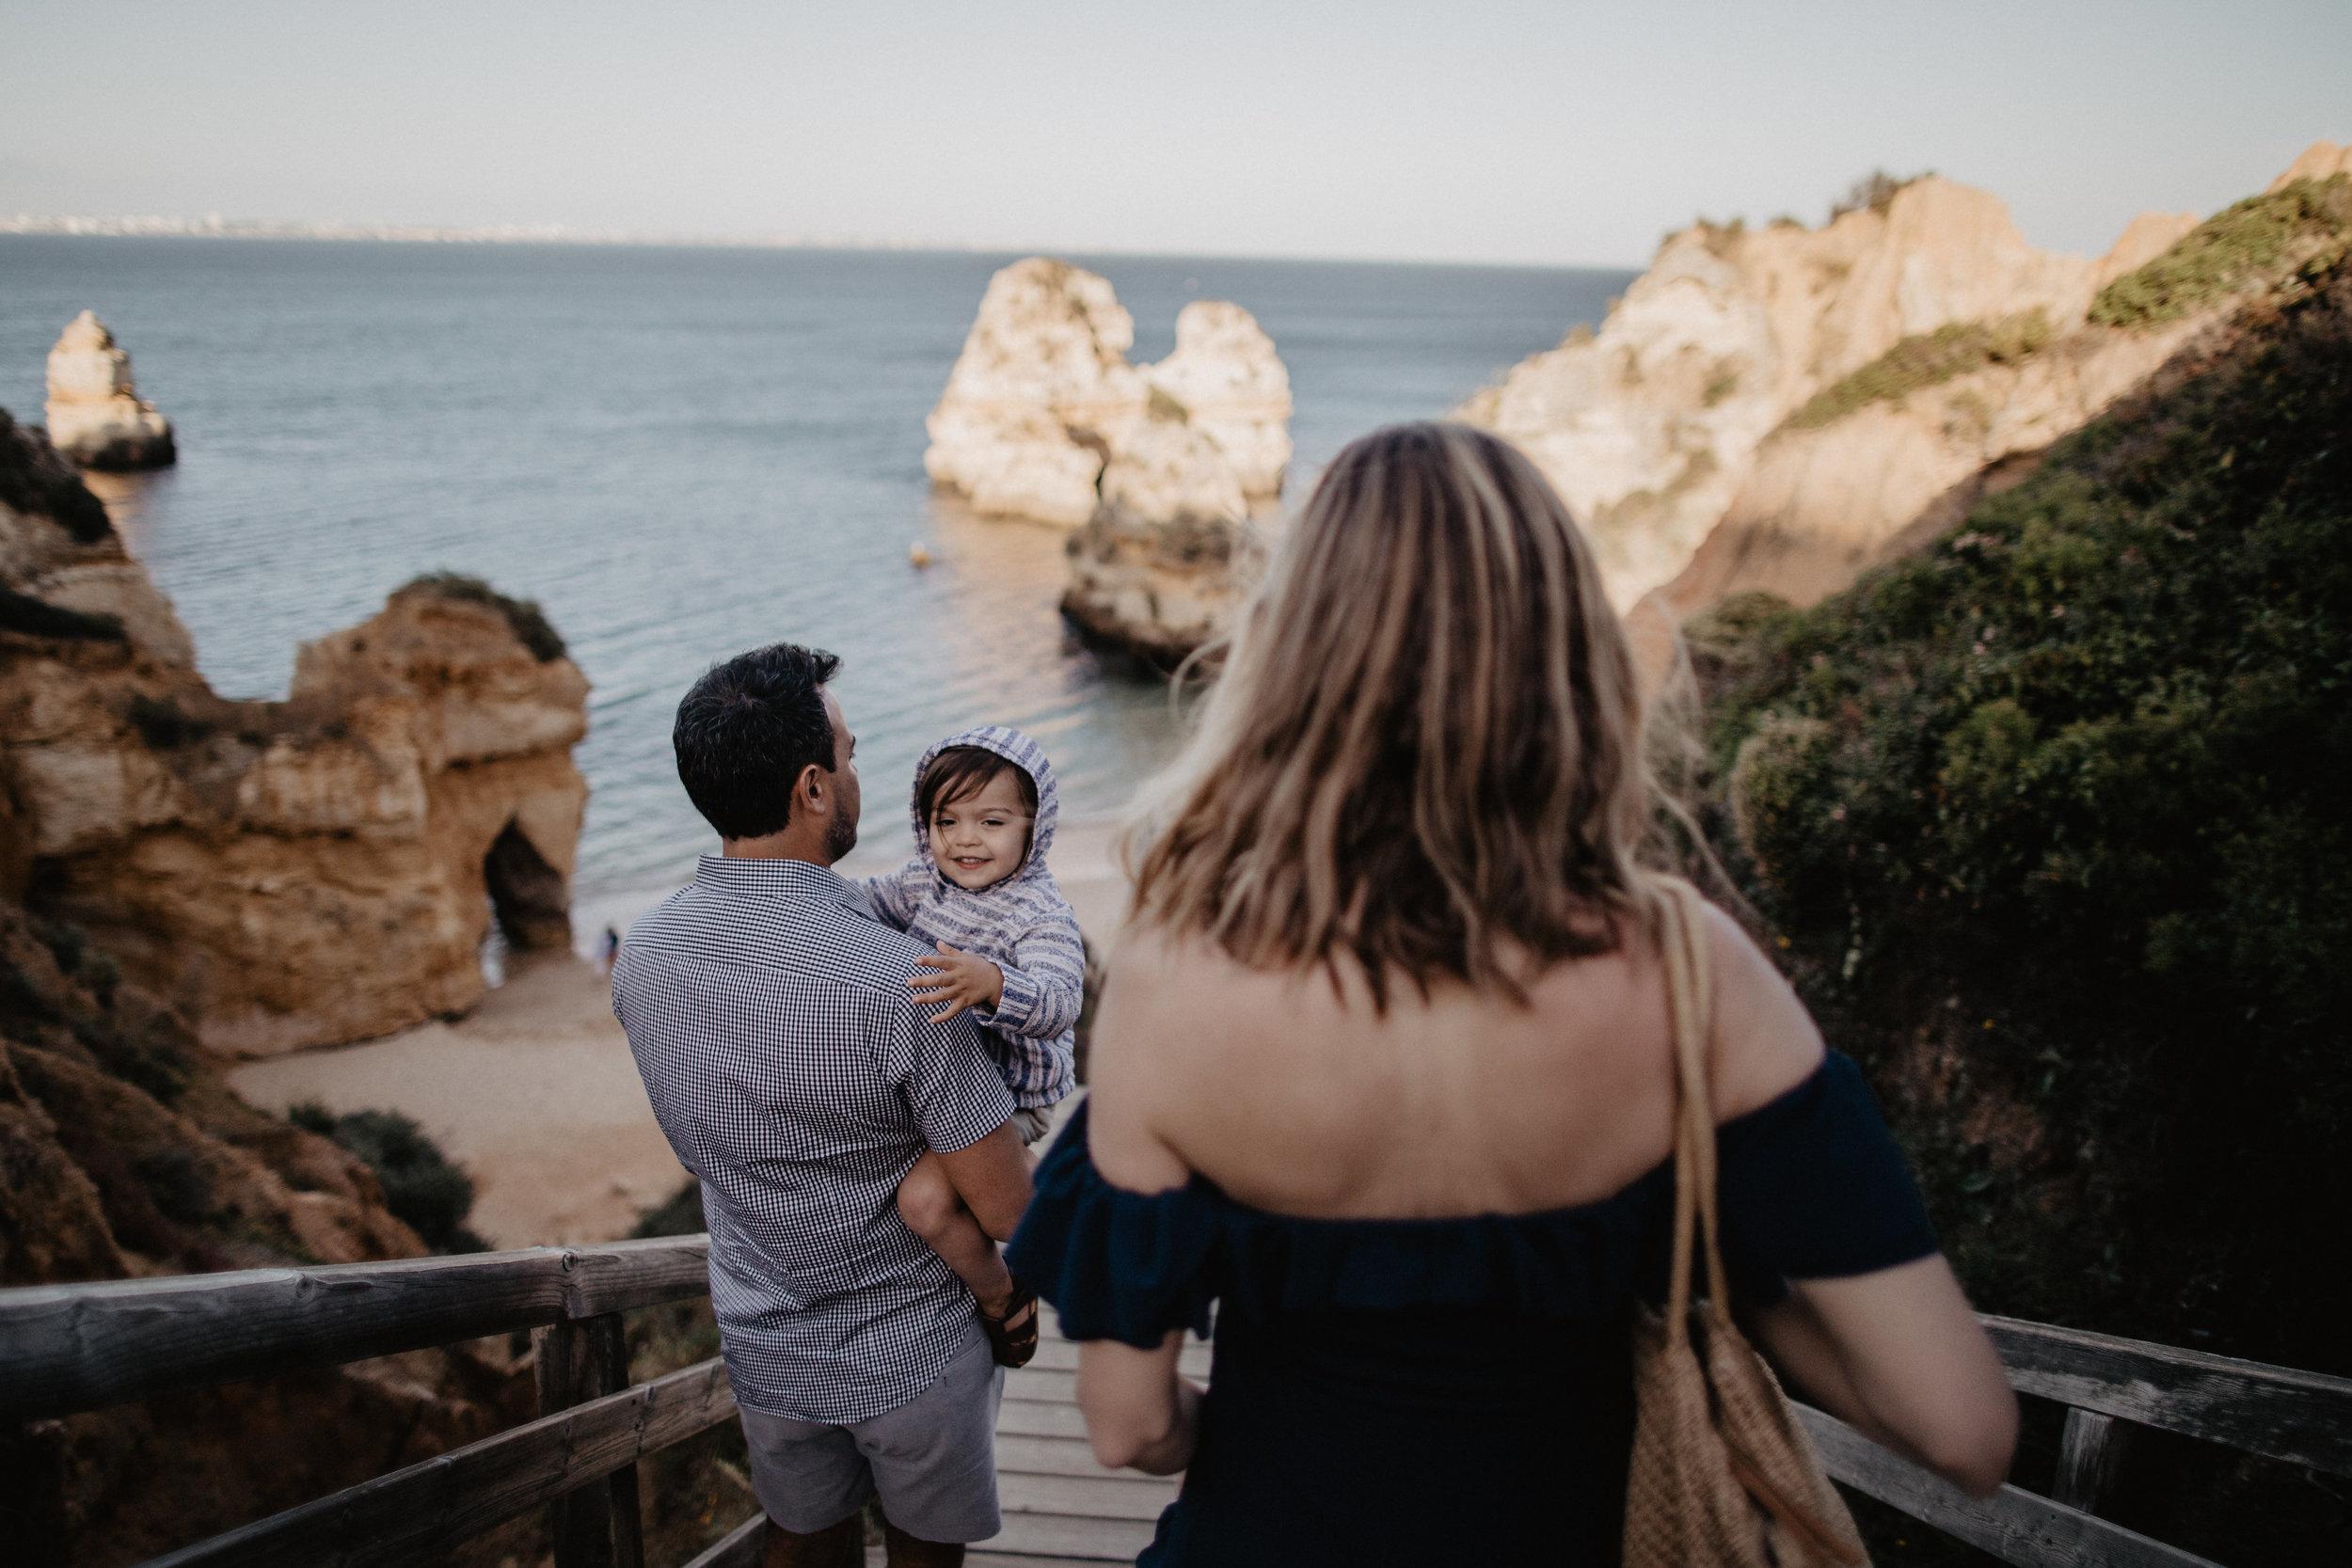 Lapela-Family-photography-Lagos-Algarve22.jpg